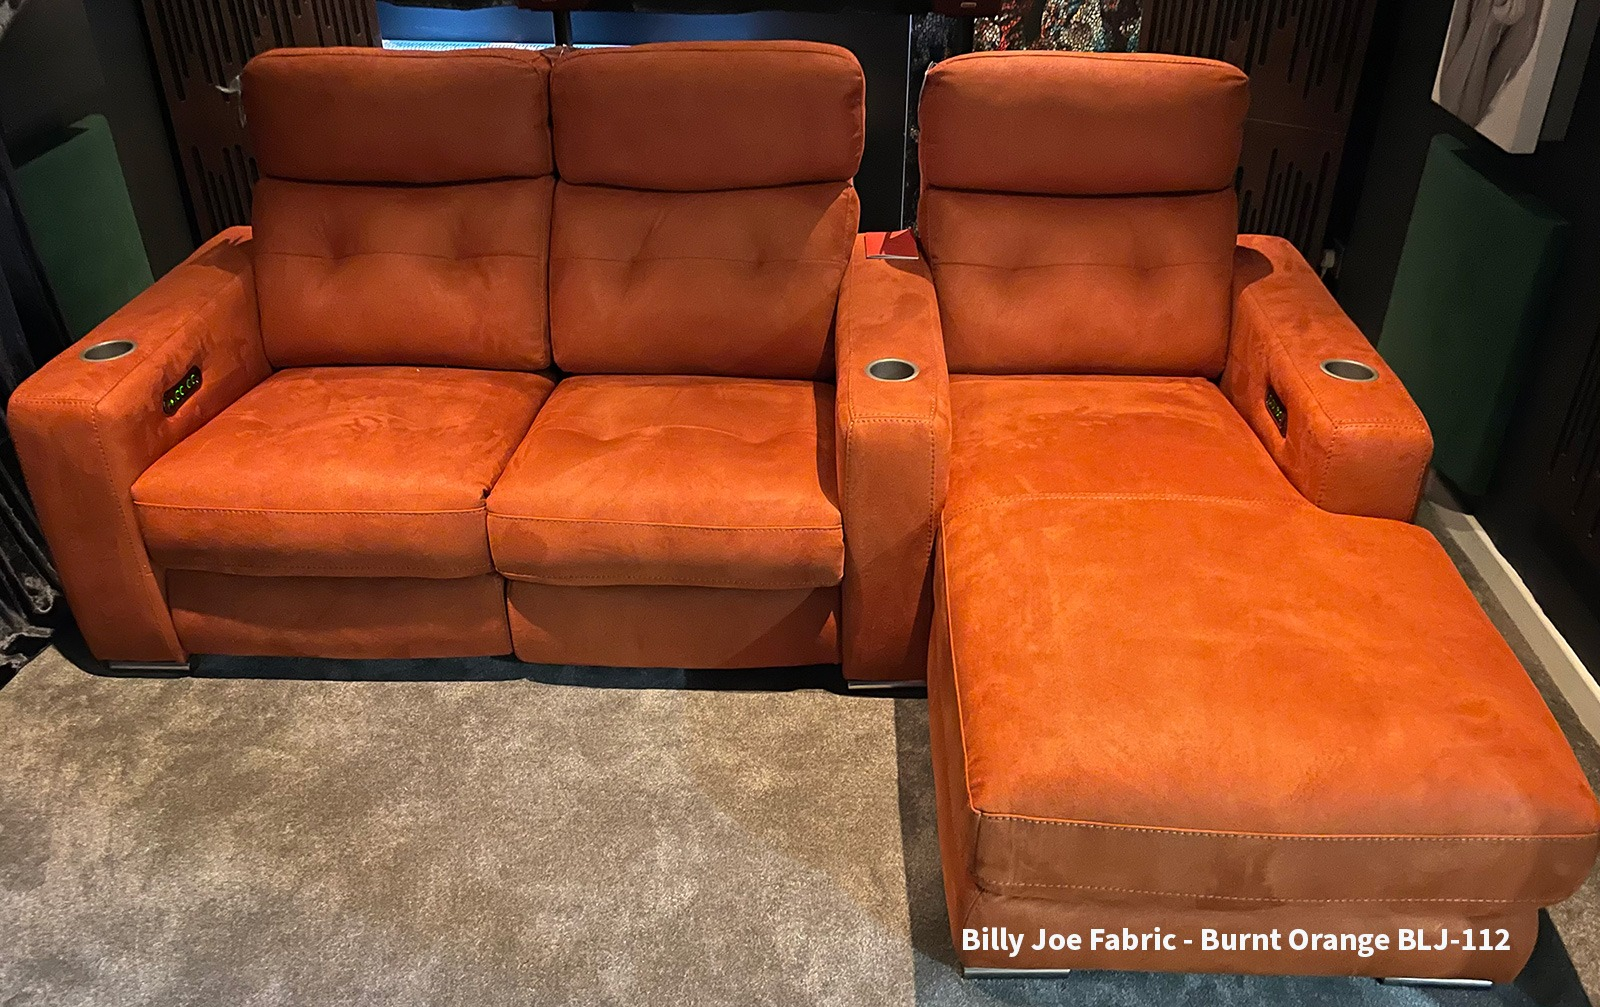 Frontrow™ Serenity home cinema seating Billy Joe Burnt orange